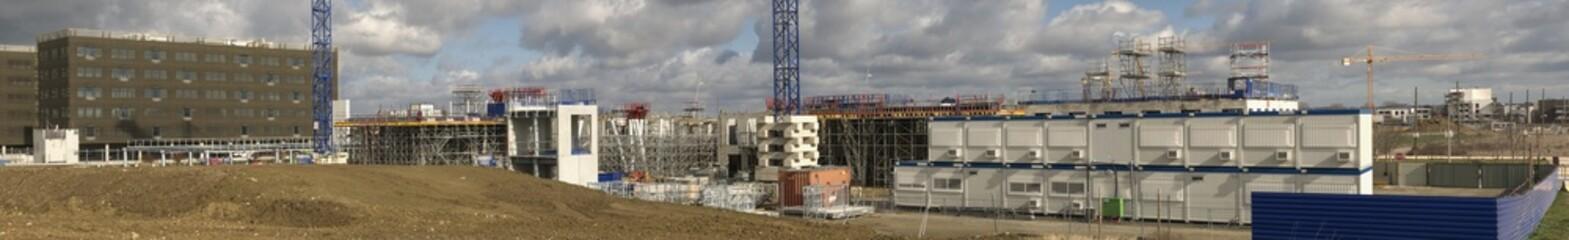 Panoramique chantier